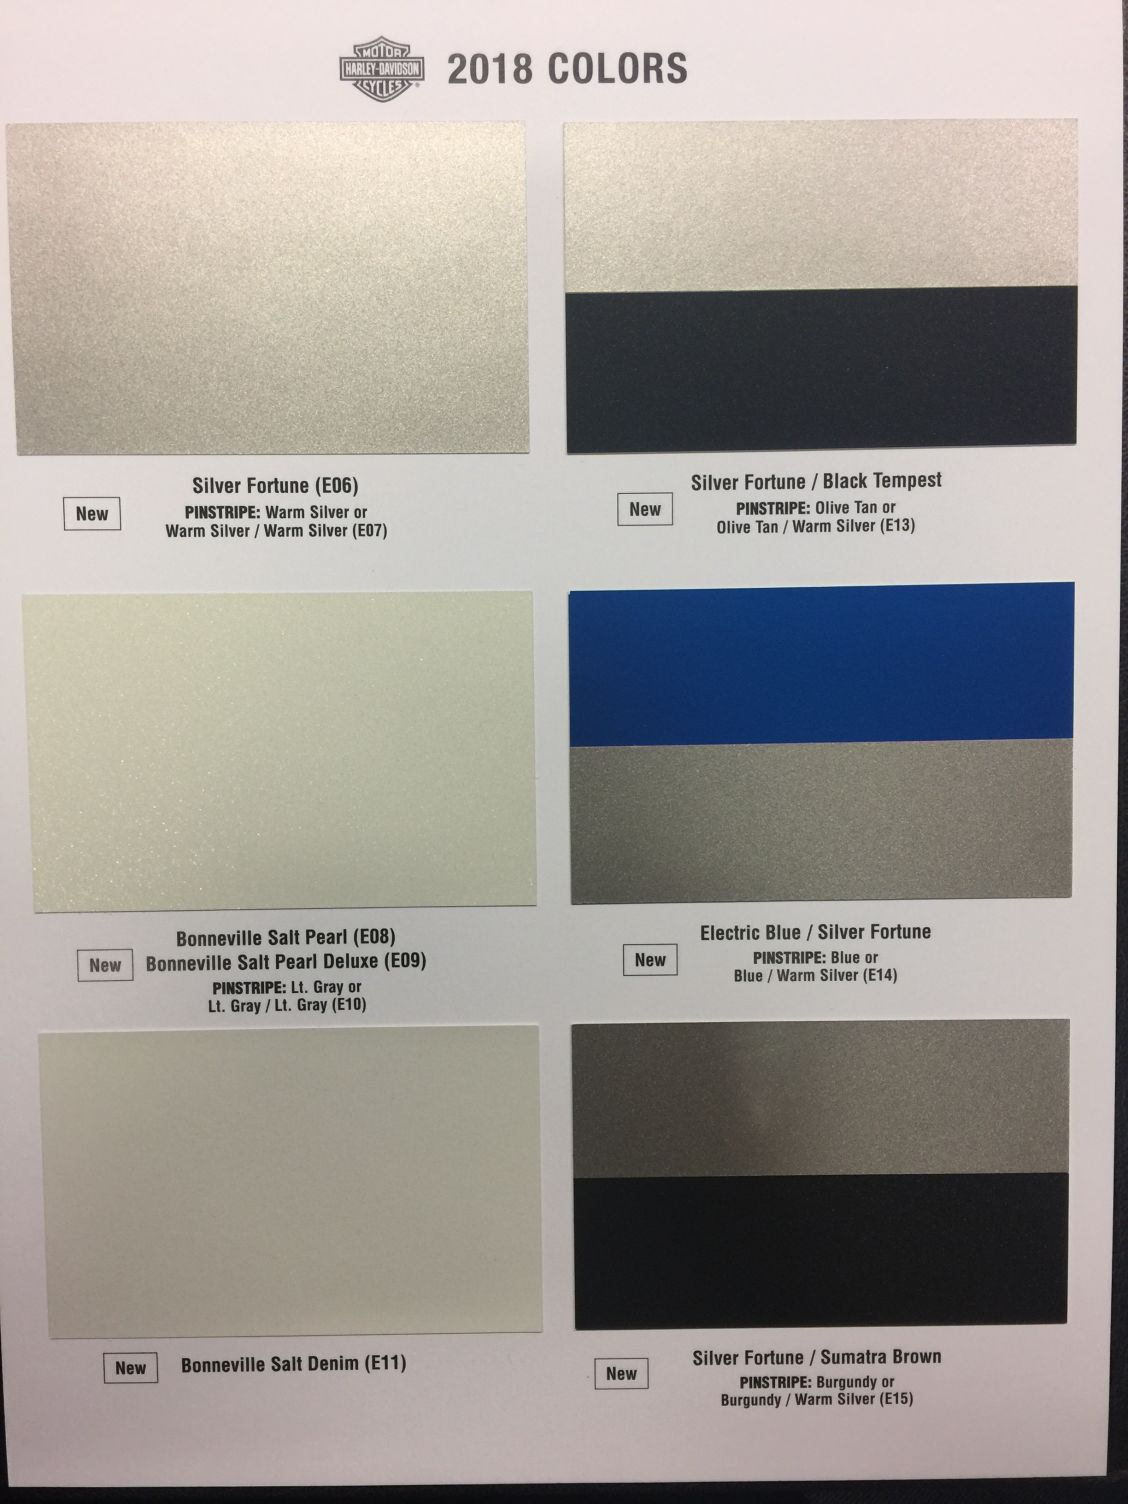 harley davidson colors codes